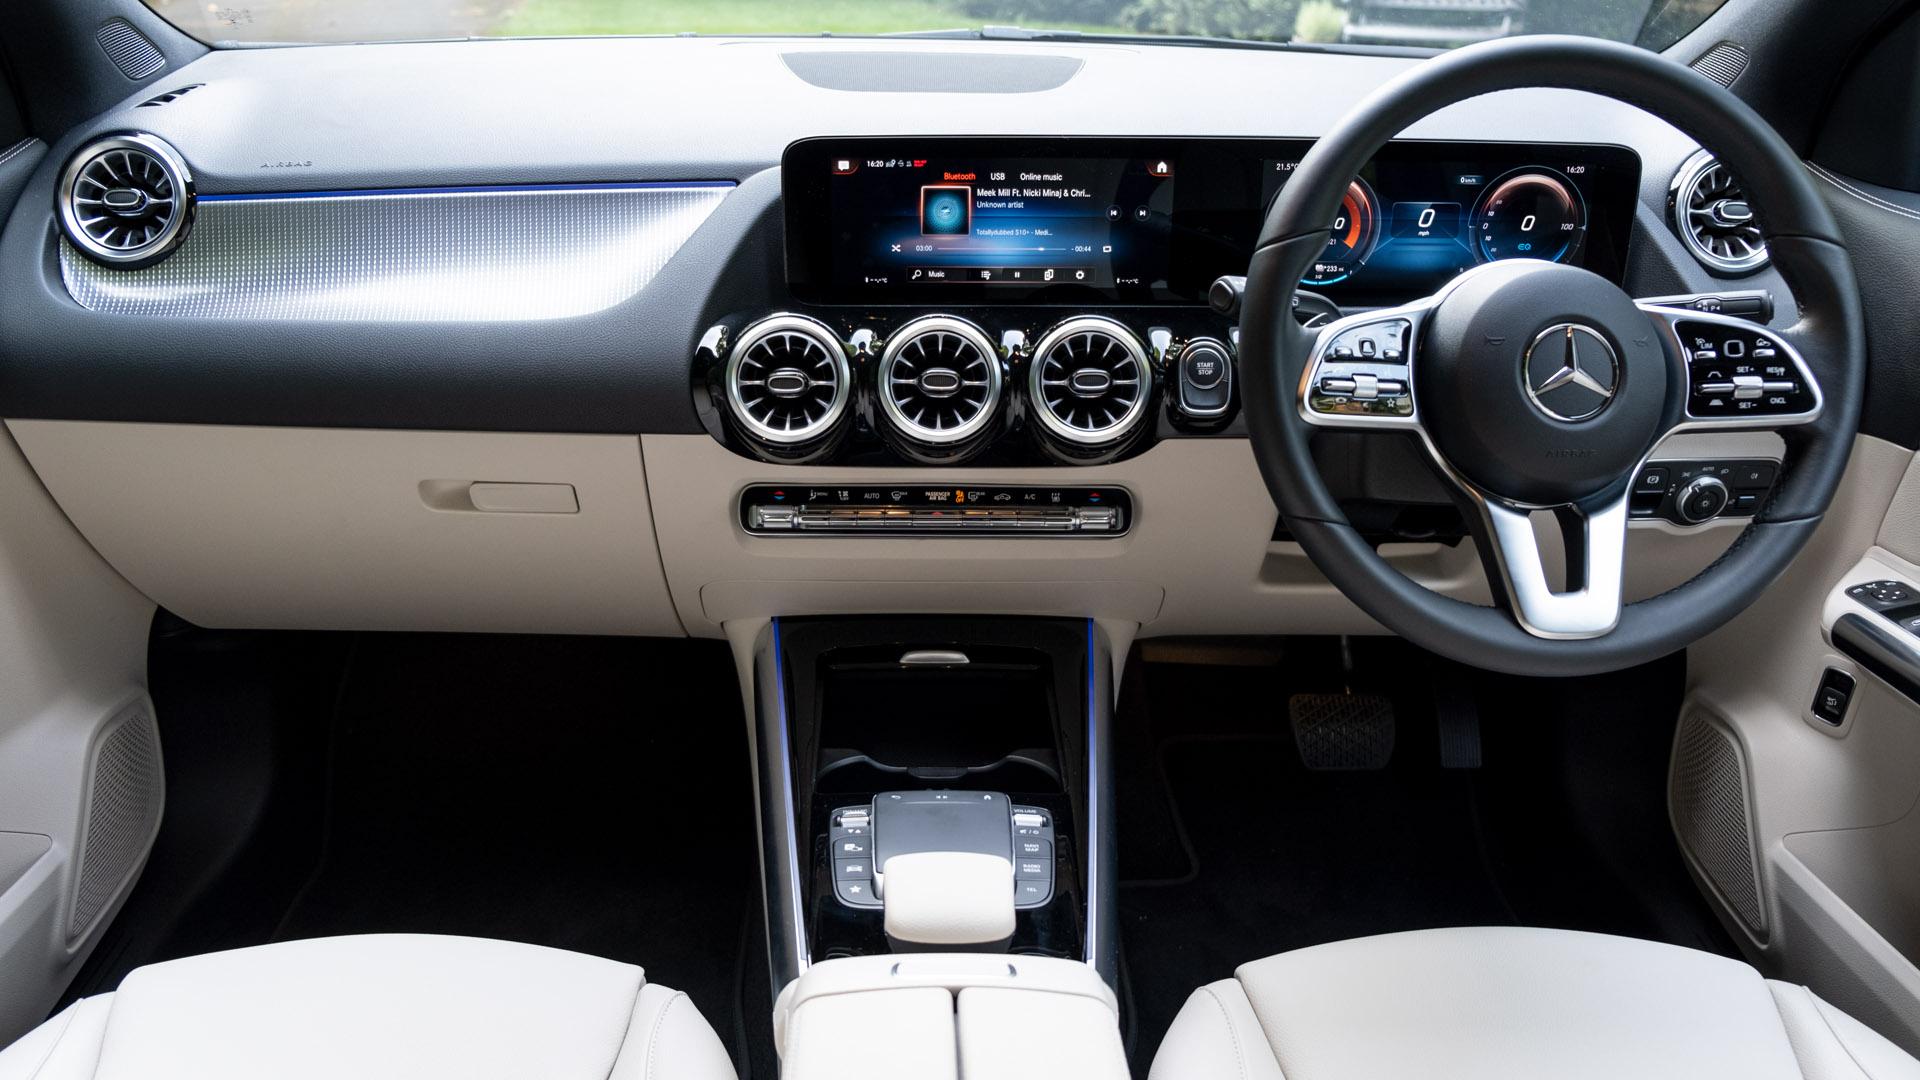 Mercedes EQA cabin look